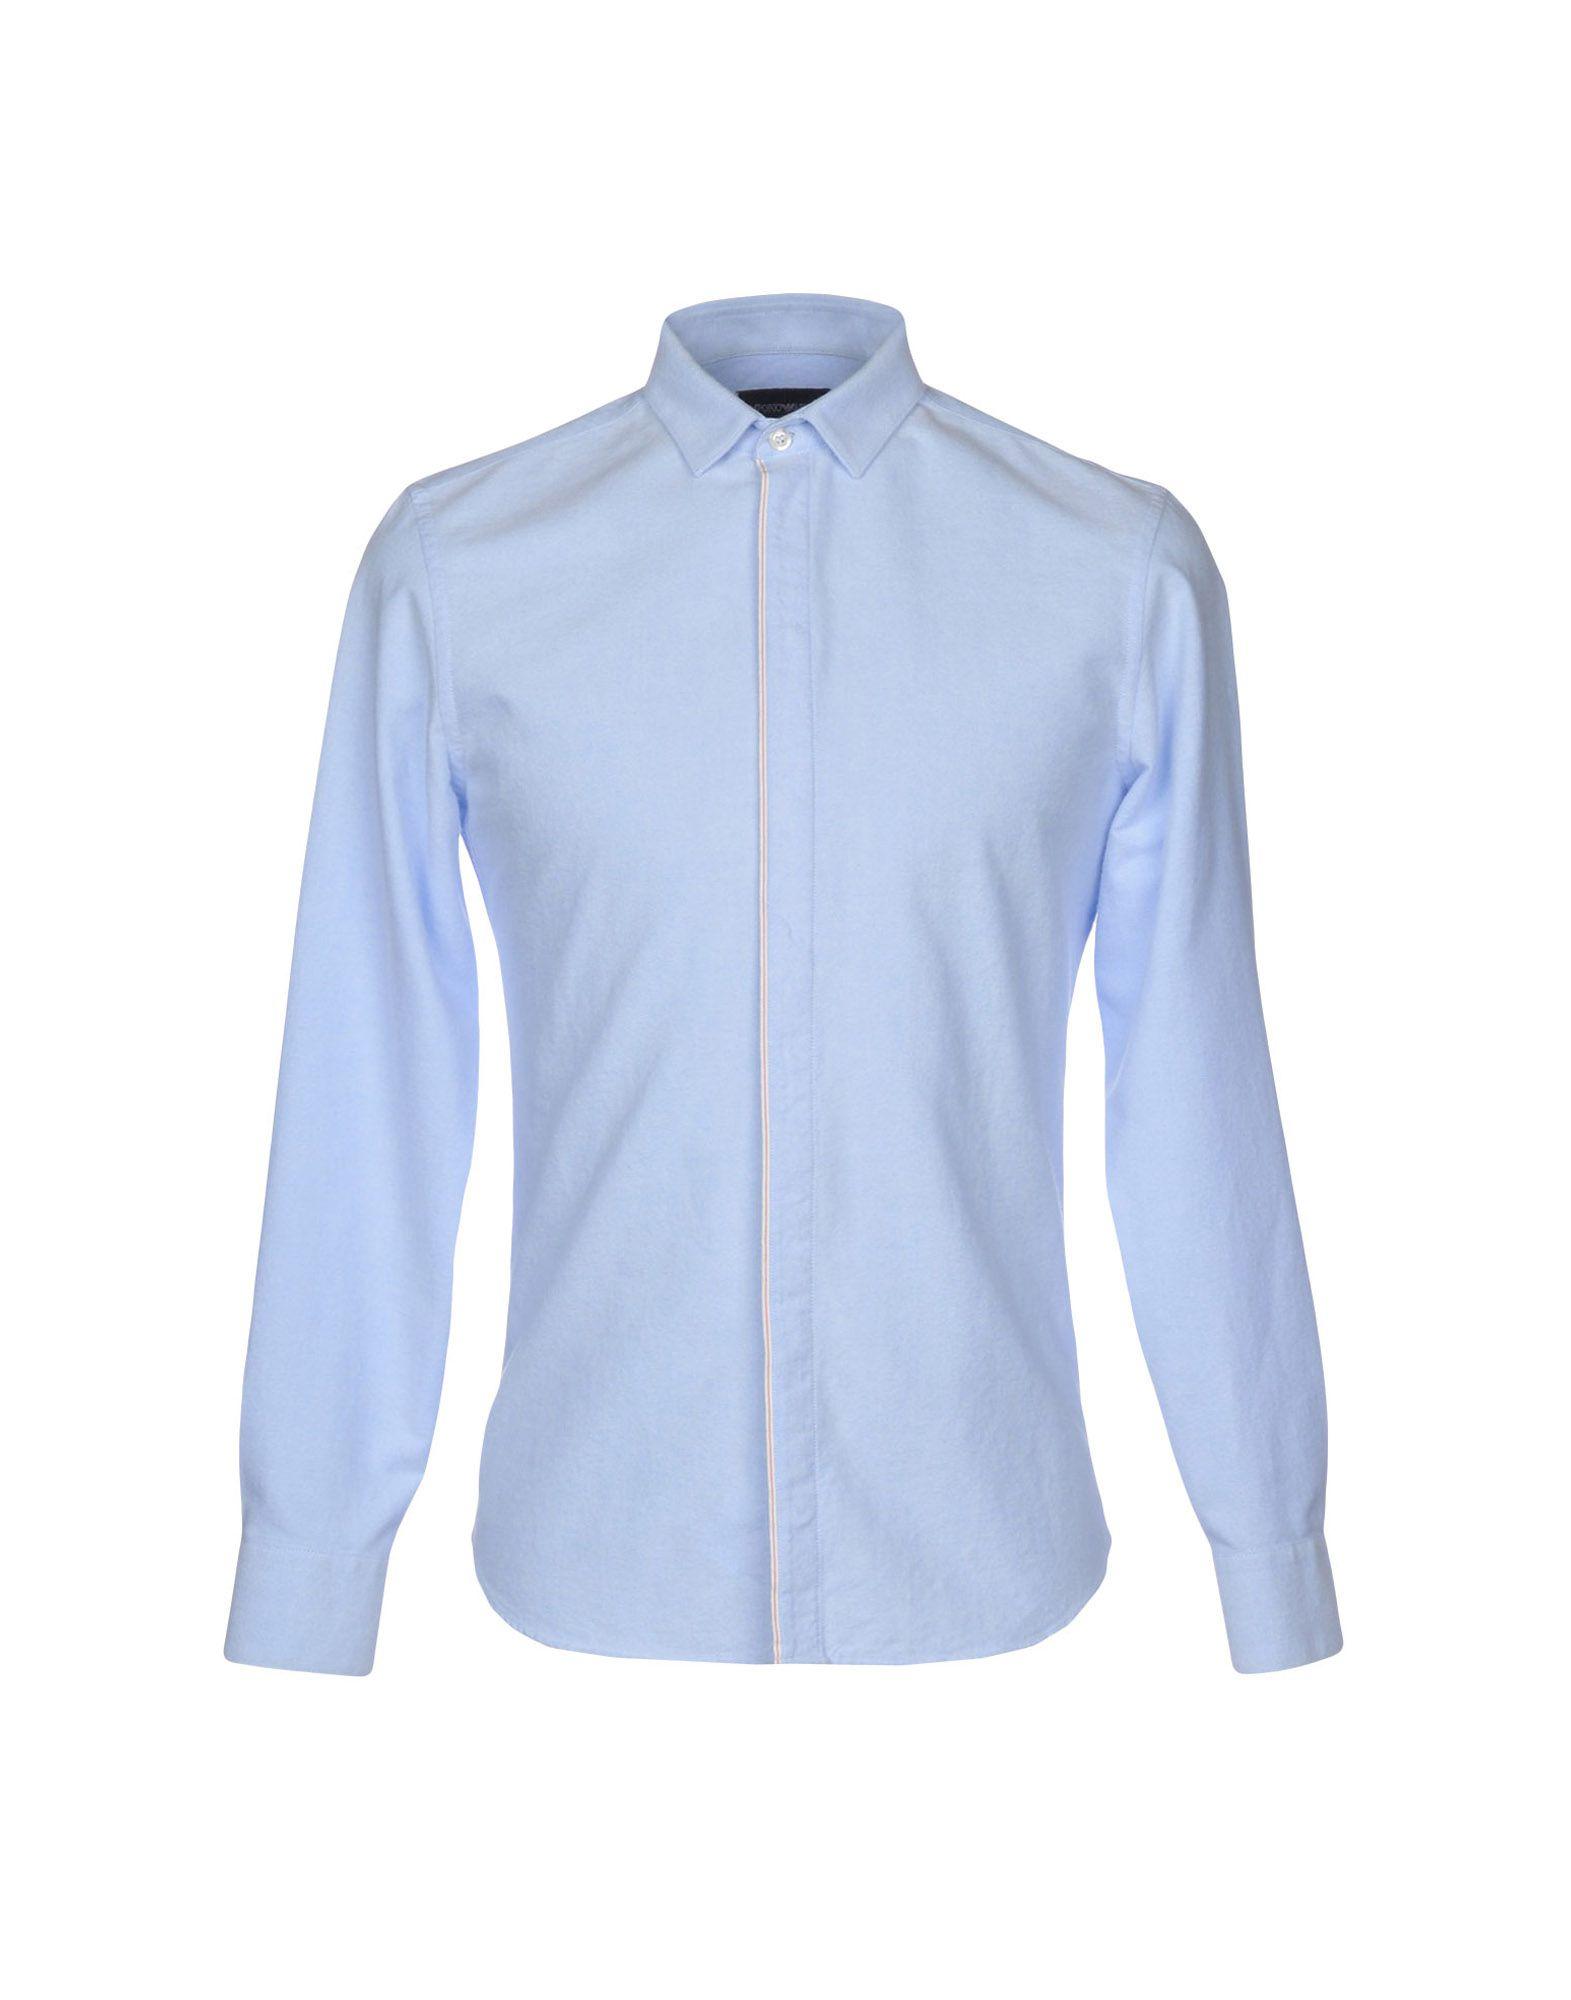 Camicia Tinta Unita Emporio Armani Uomo 38765264AH - 38765264AH Uomo 124187